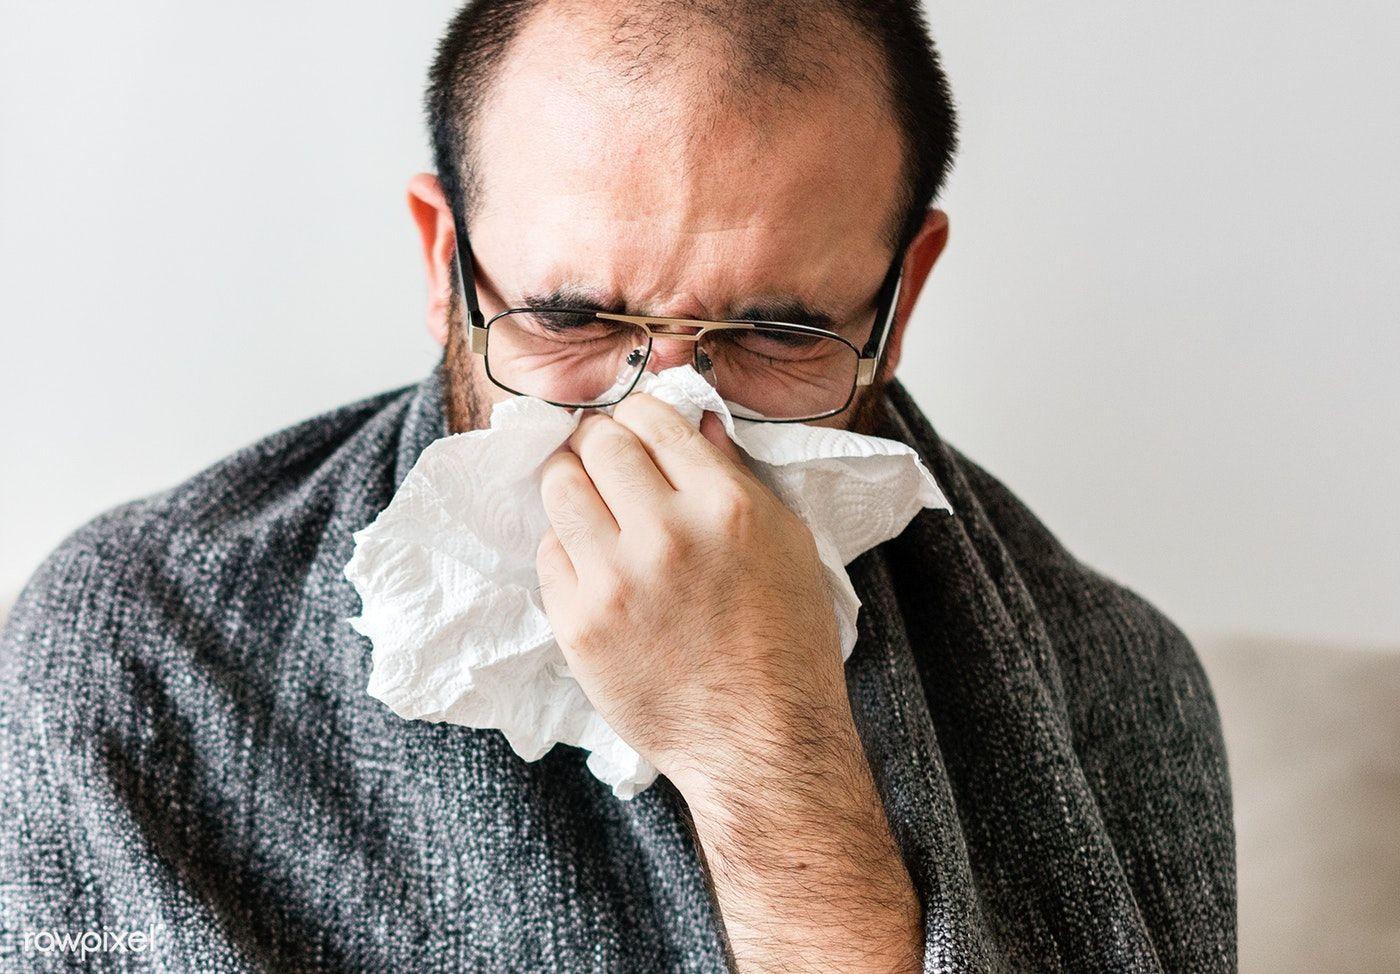 Download premium photo of Man sneezing into tissue paper